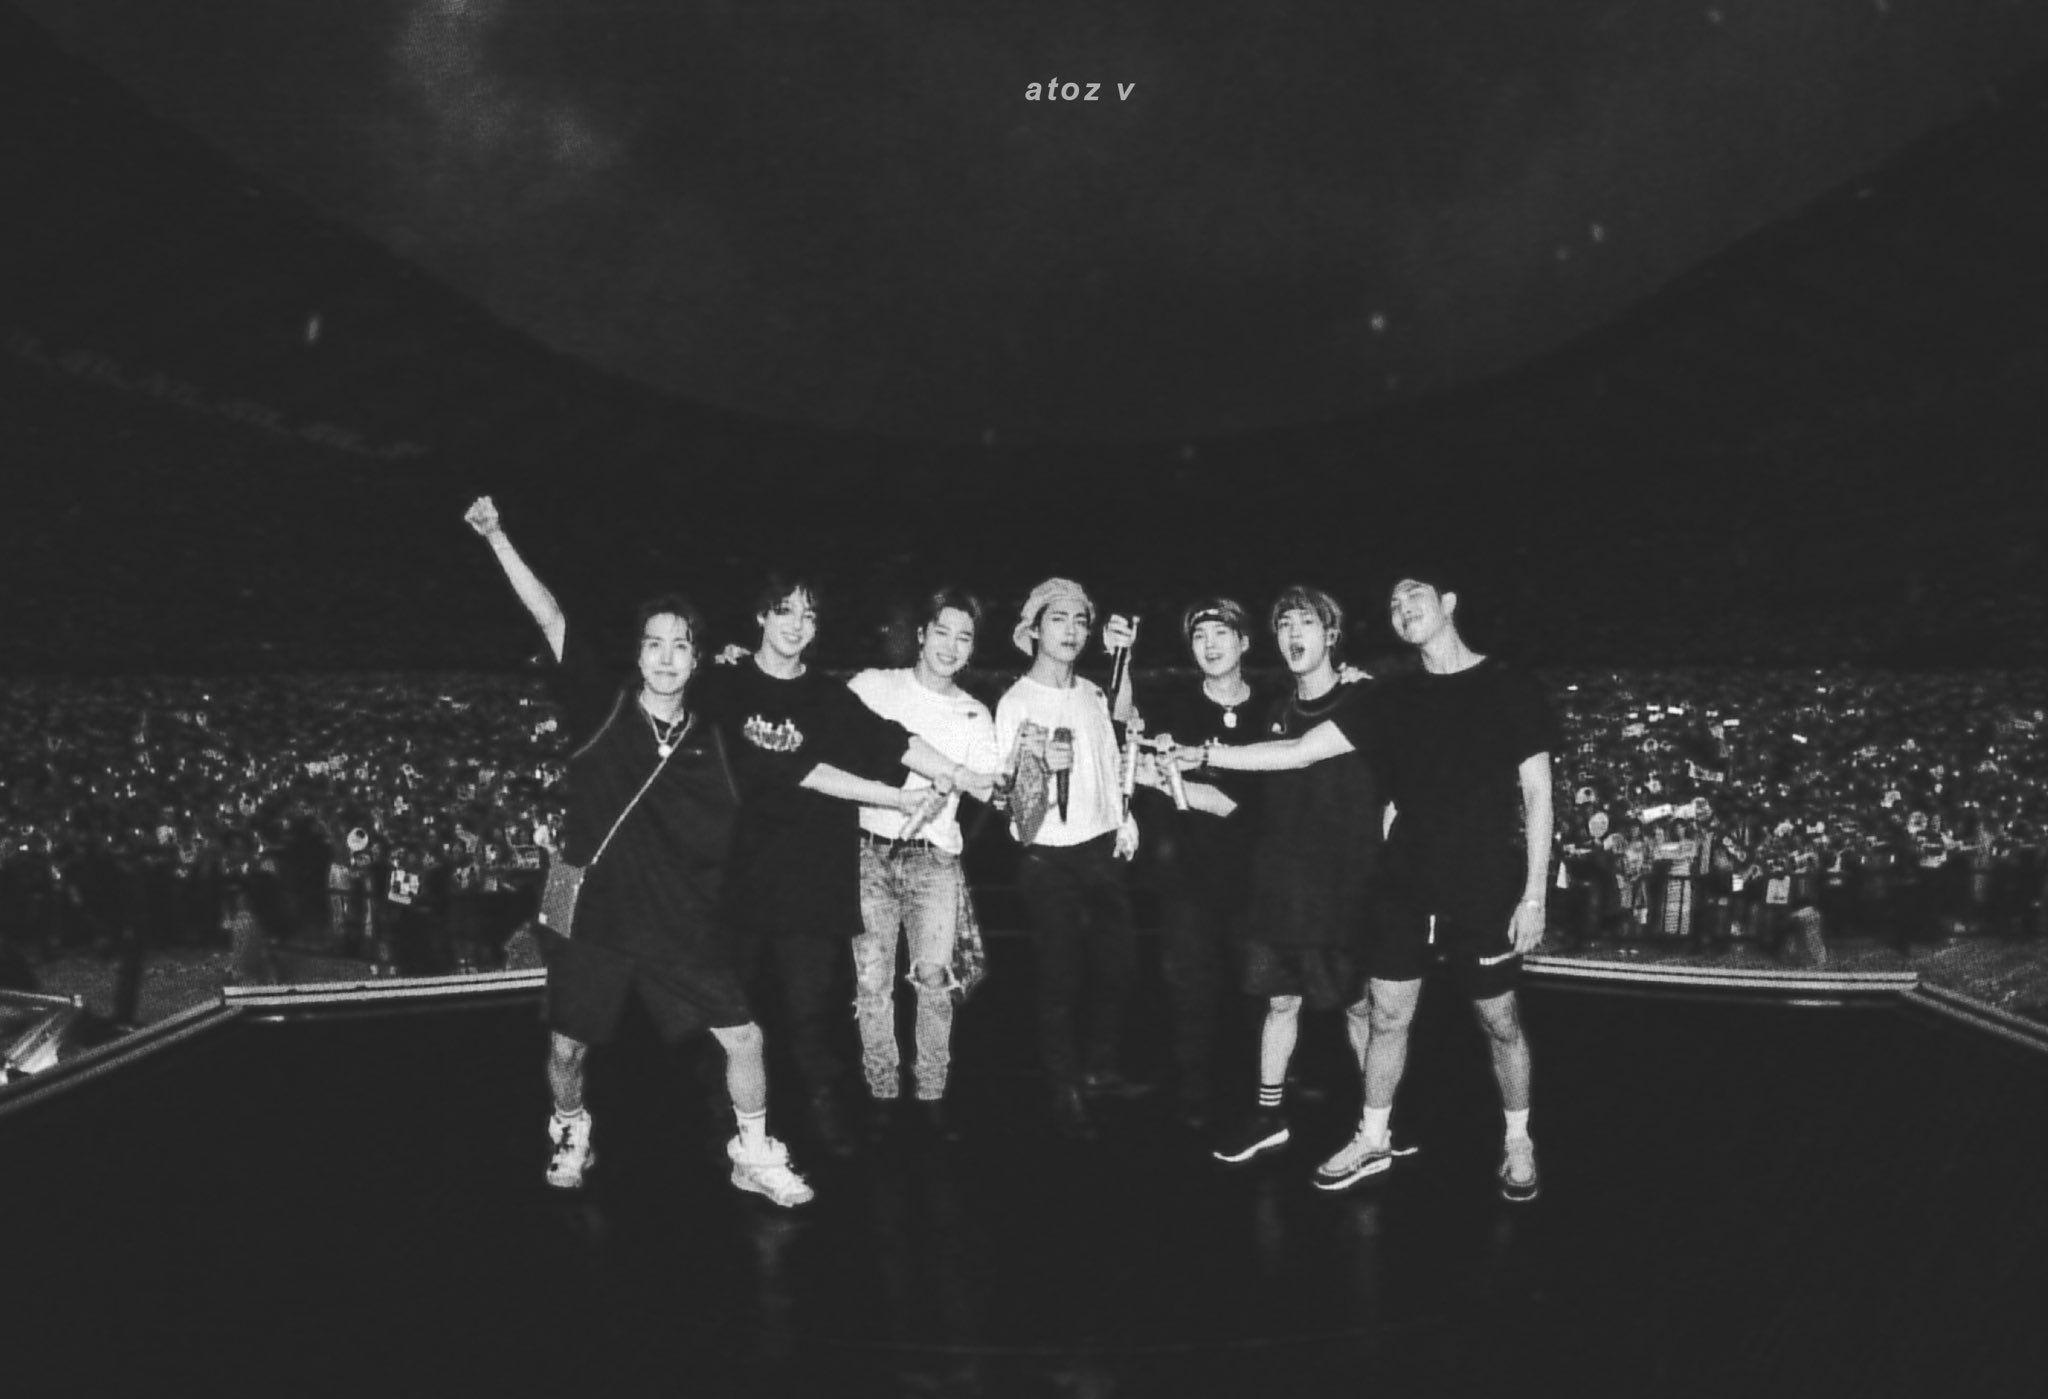 Atoz V On Twitter Bts Concert Bts Black And White Bts Header Bts concert wallpaper laptop hd